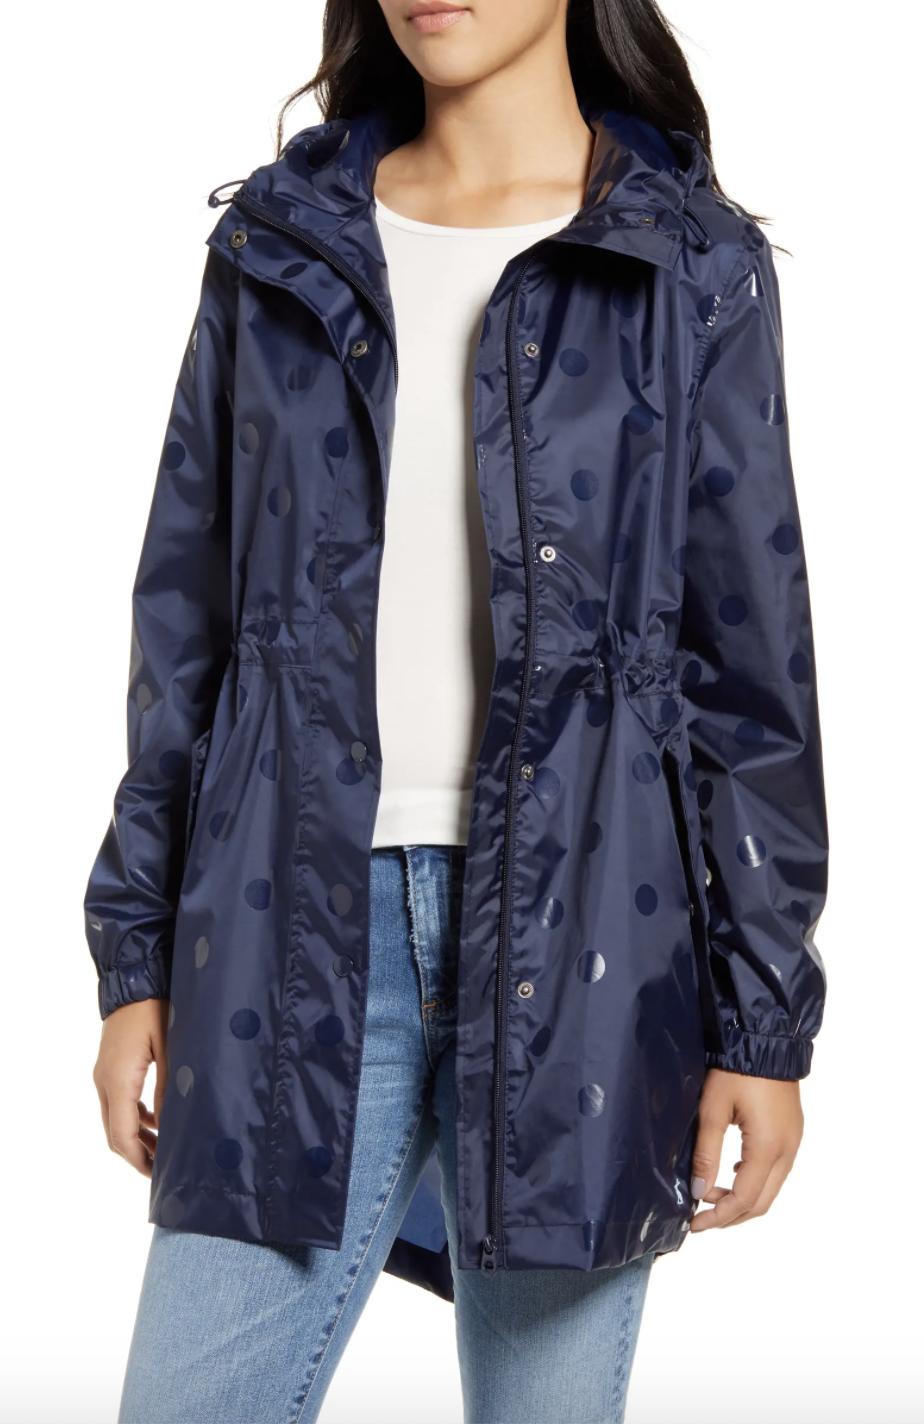 cute rain jackets to shop